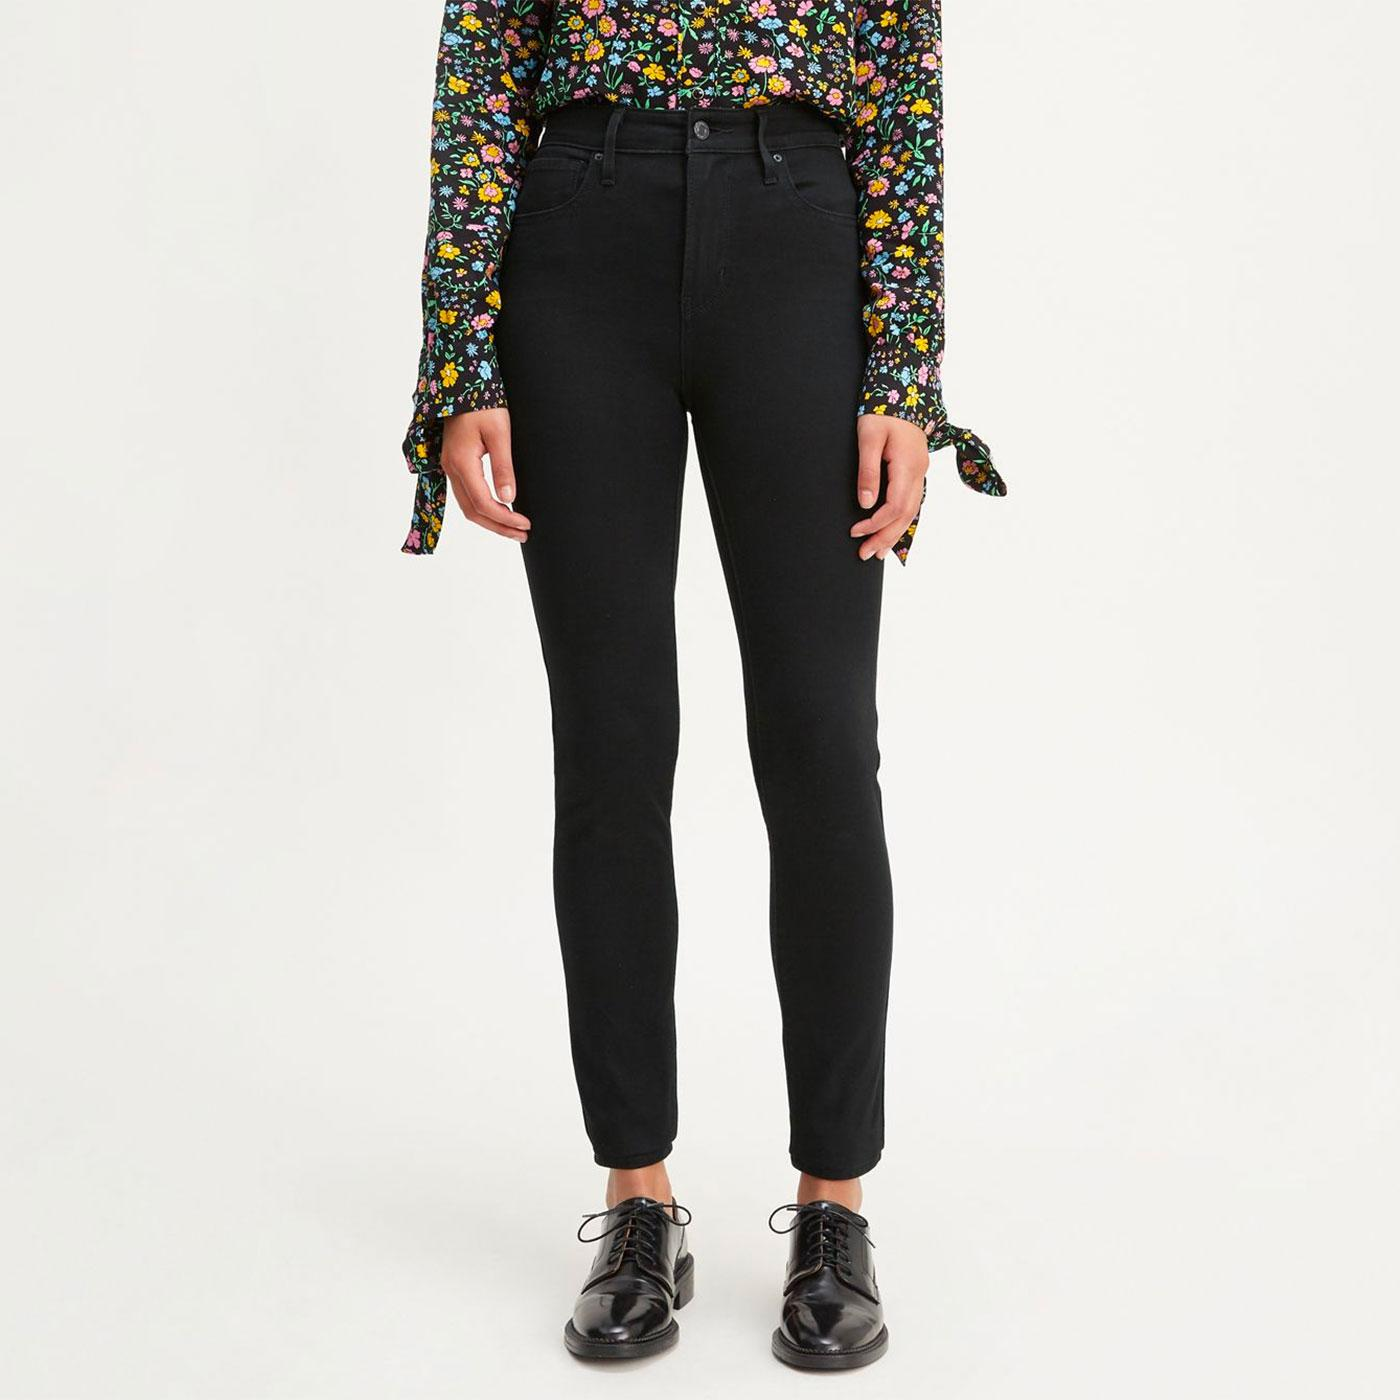 LEVI'S 721 High Rise Skinny Jeans - Long Shot